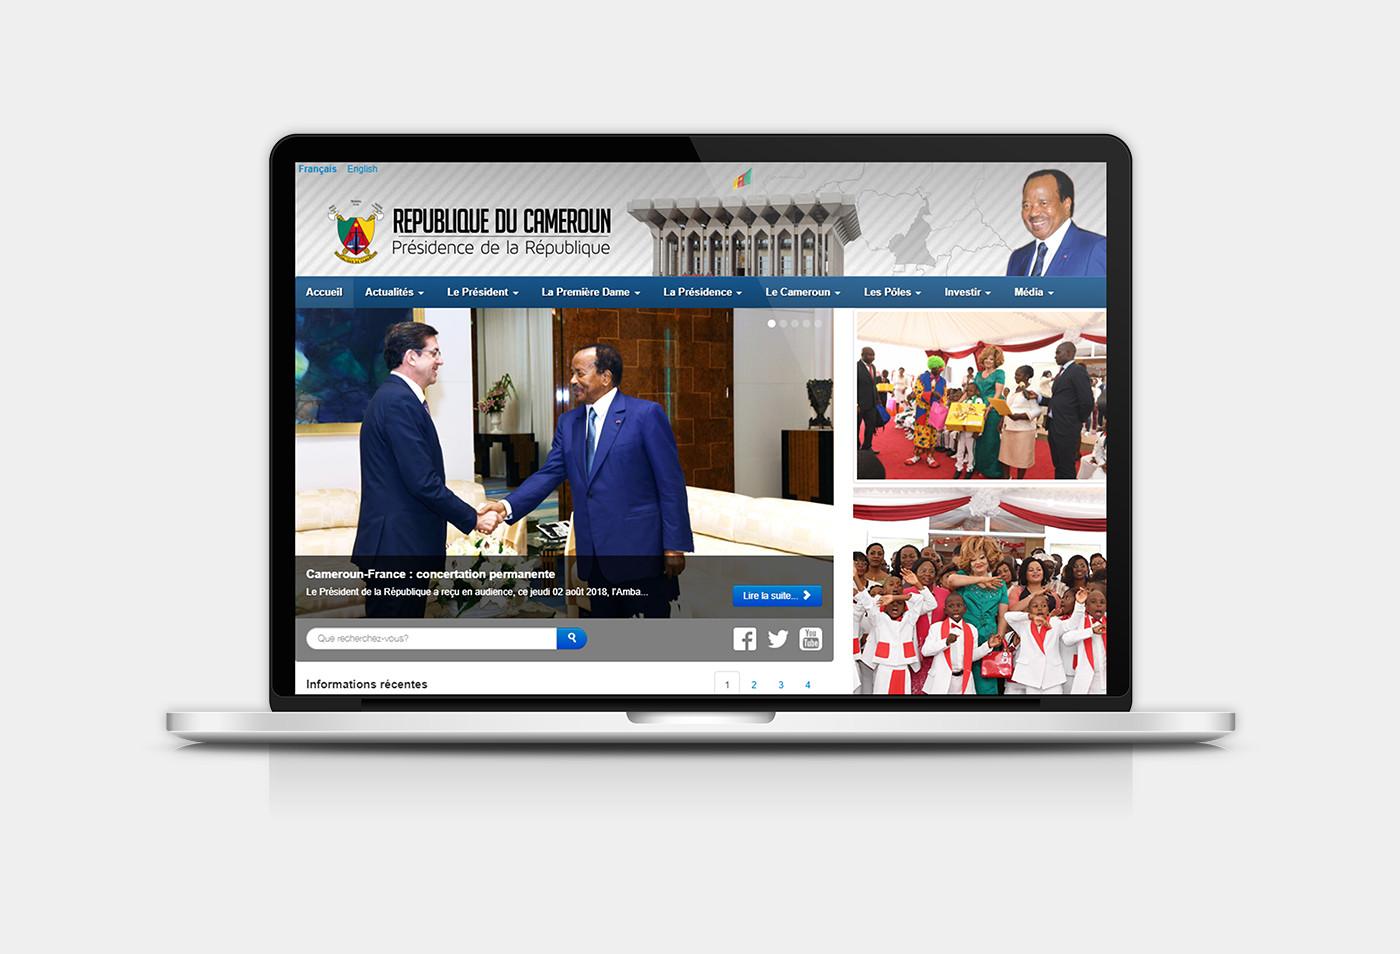 Republic of Cameroon 2015